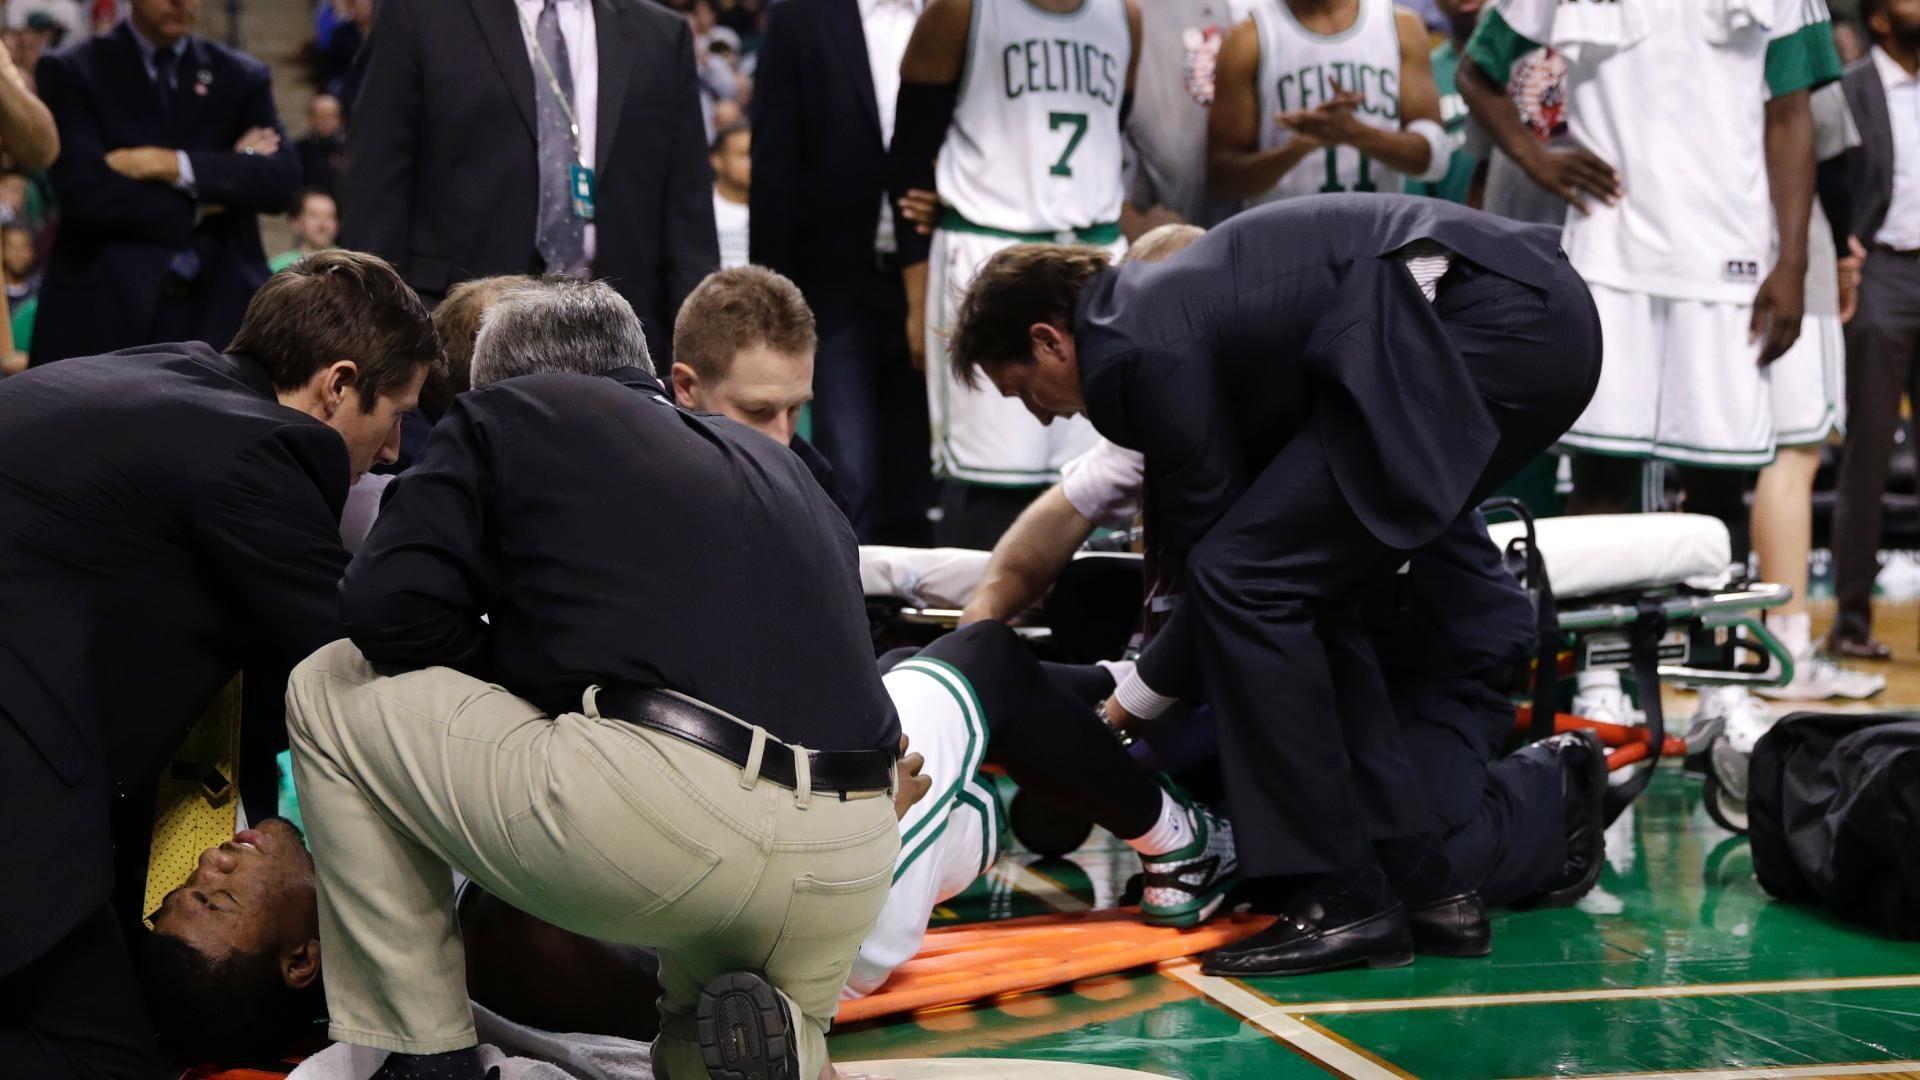 https://secure.espncdn.com/combiner/i?img=/media/motion/2014/1107/dm_141107_Pacers_Celtics_Highlight/dm_141107_Pacers_Celtics_Highlight.jpg